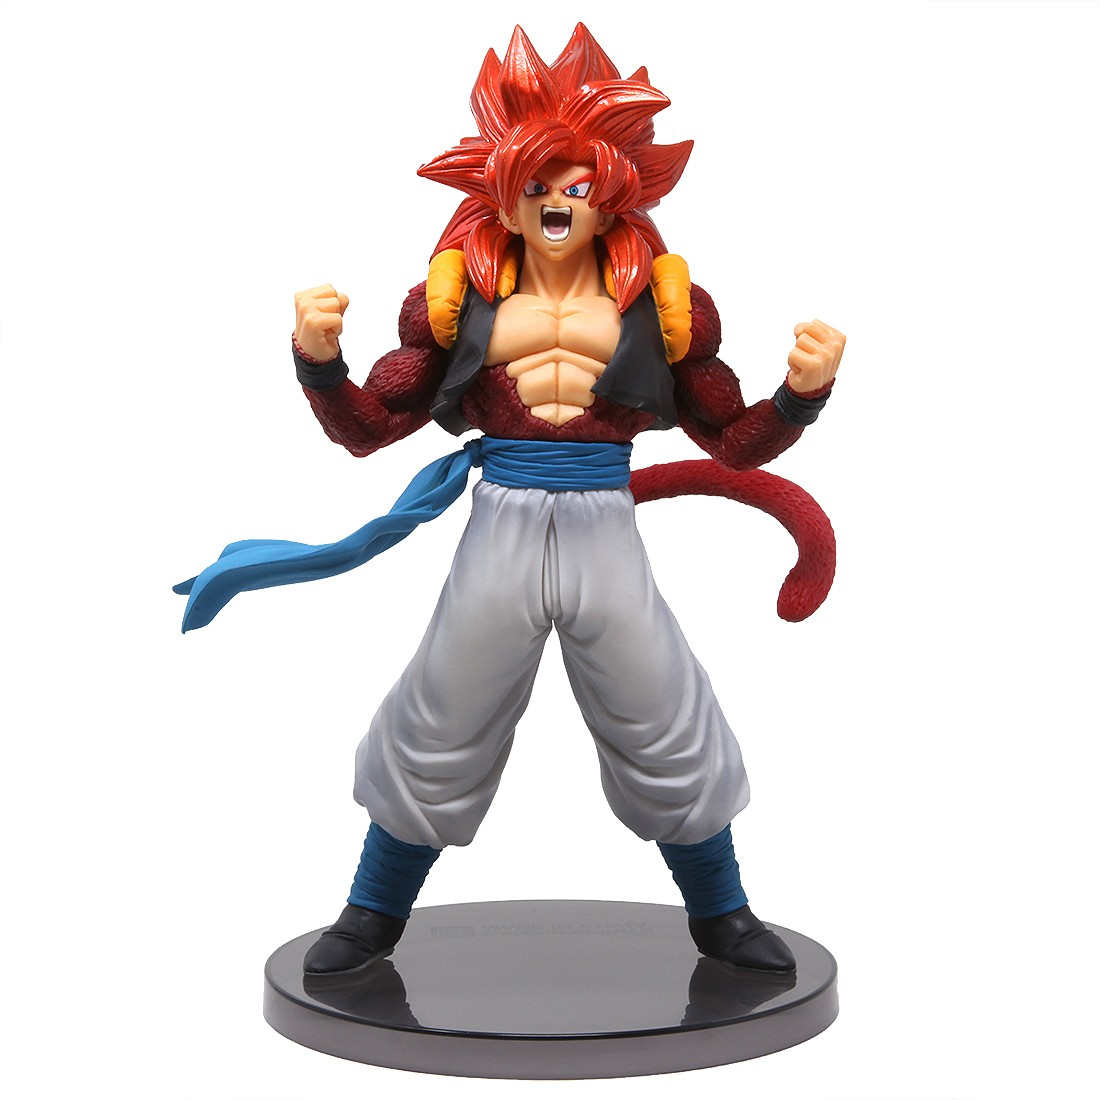 Banpresto Dragon Ball Gt Blood Of Saiyans Special Ver 5 Super Saiyan 4 Gogeta Figure Red